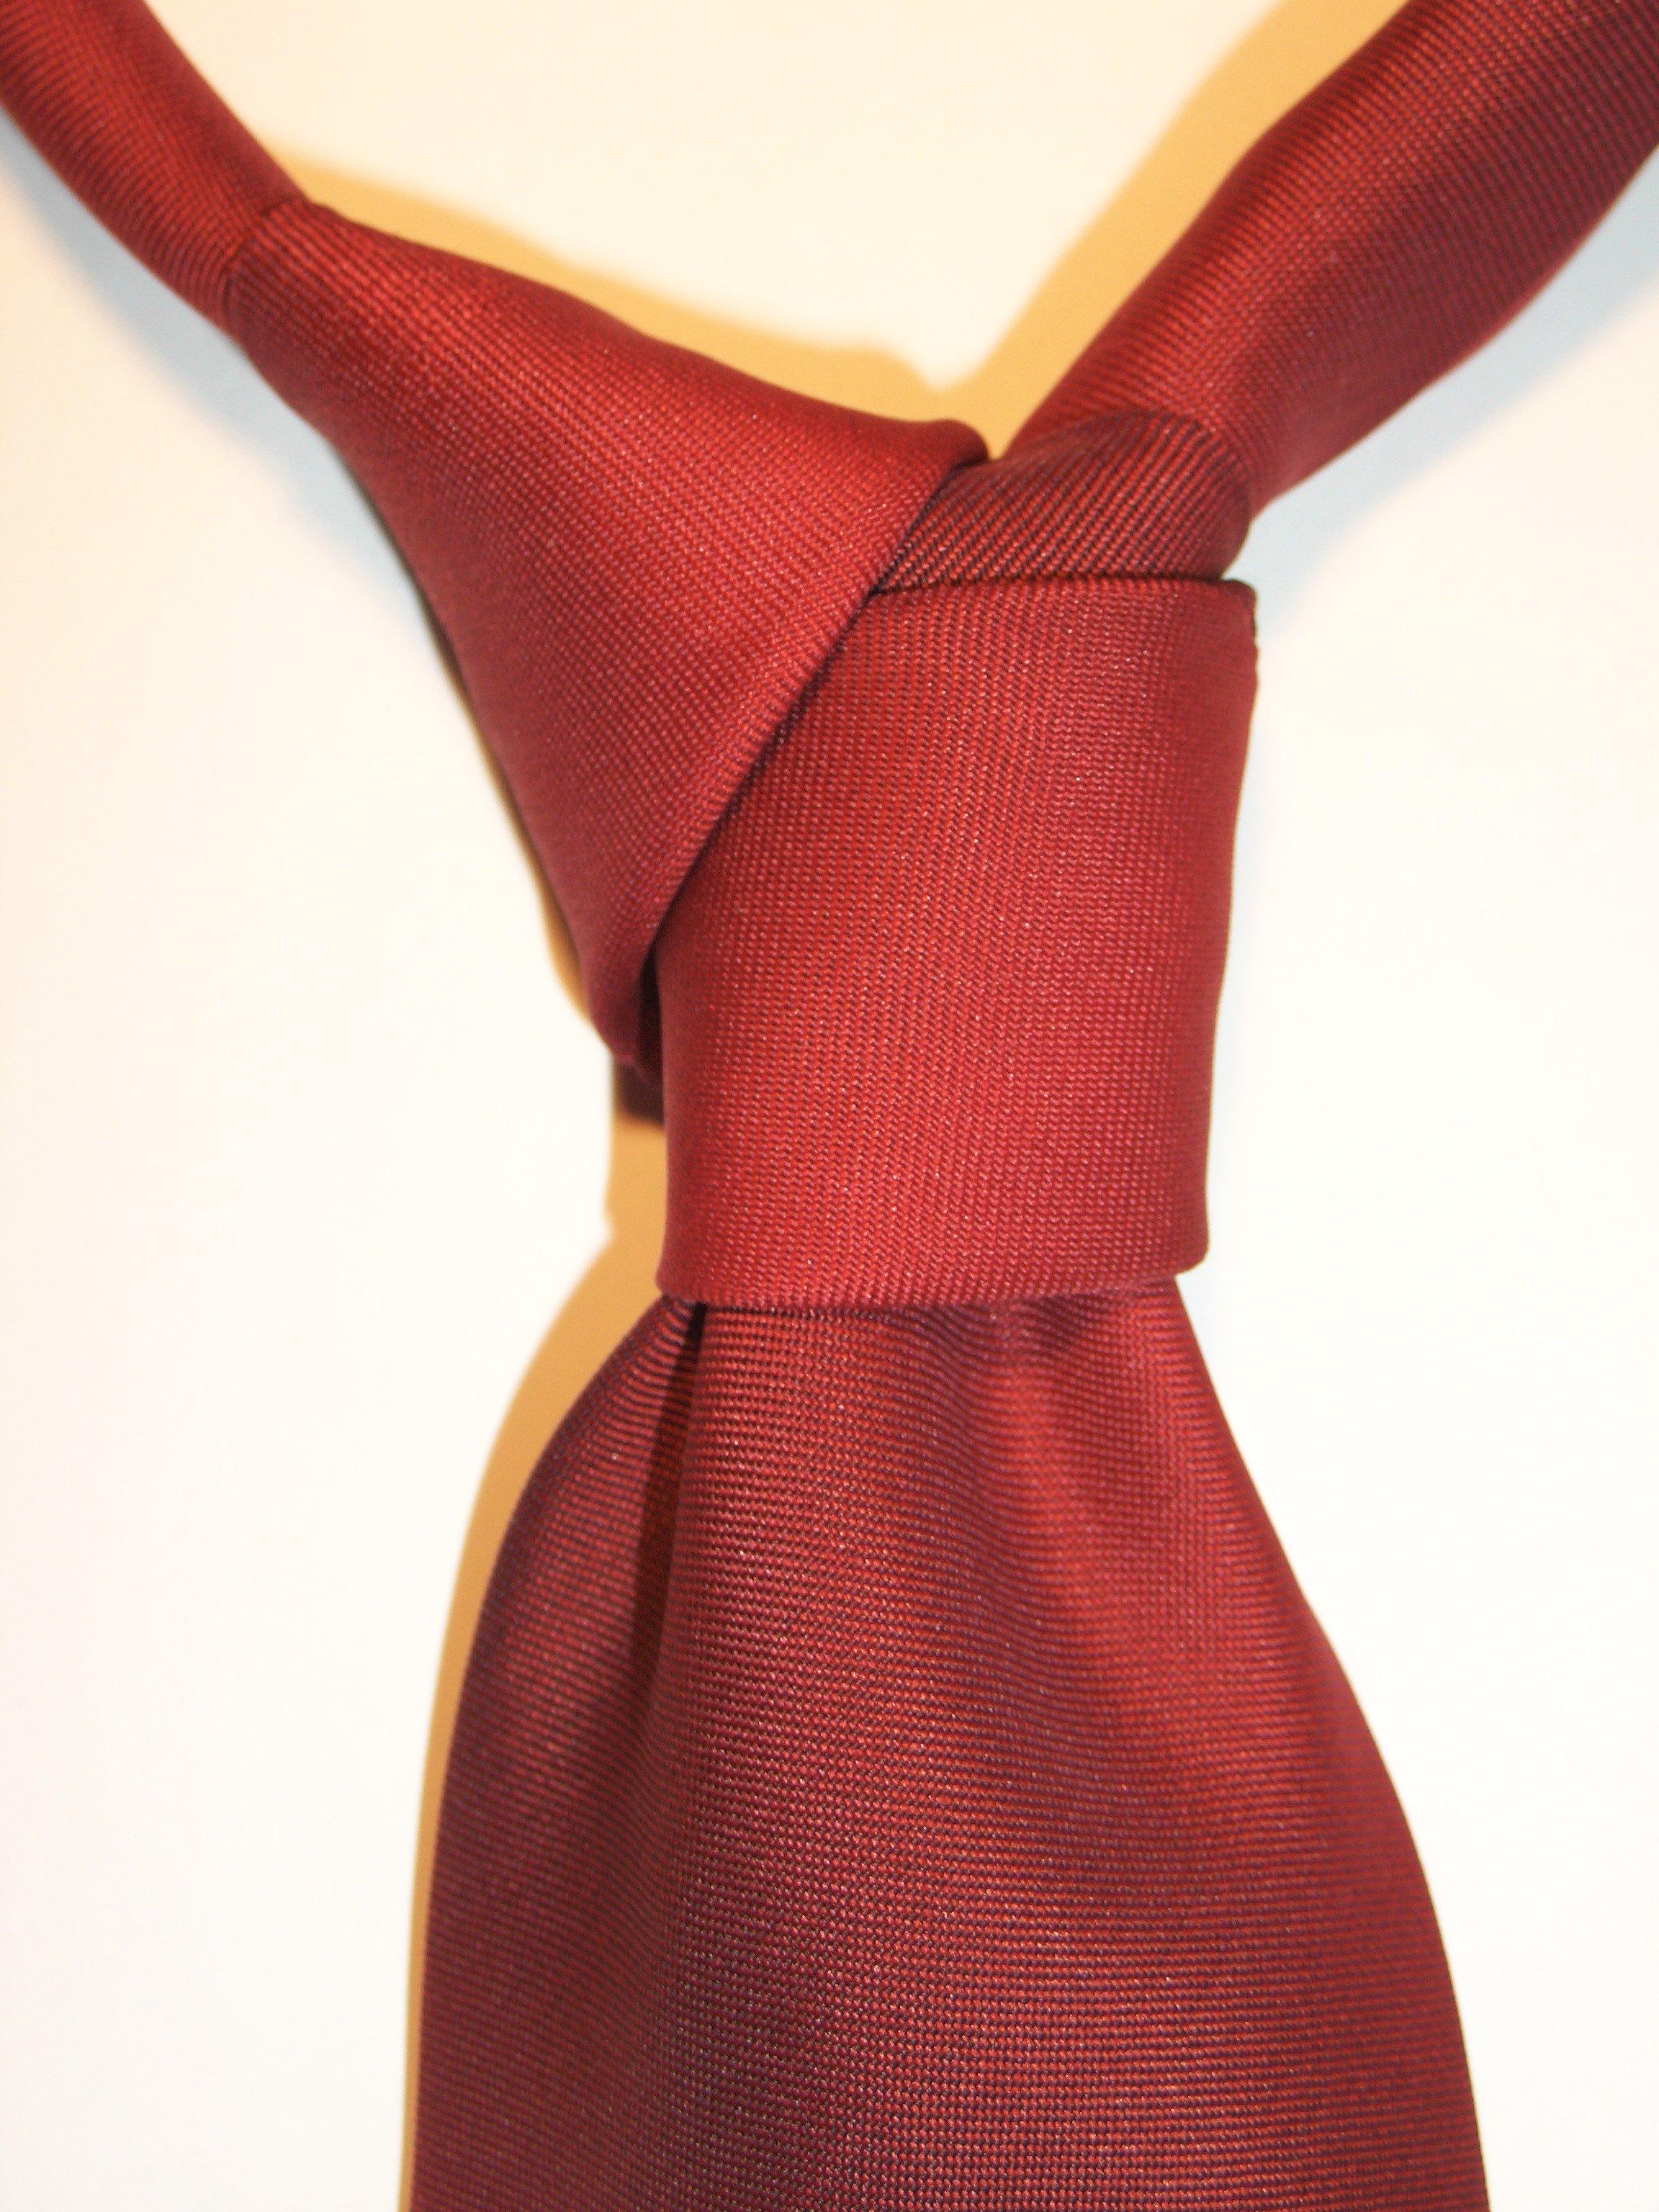 Necktie_Diagonal_knot TheGoldenStyle